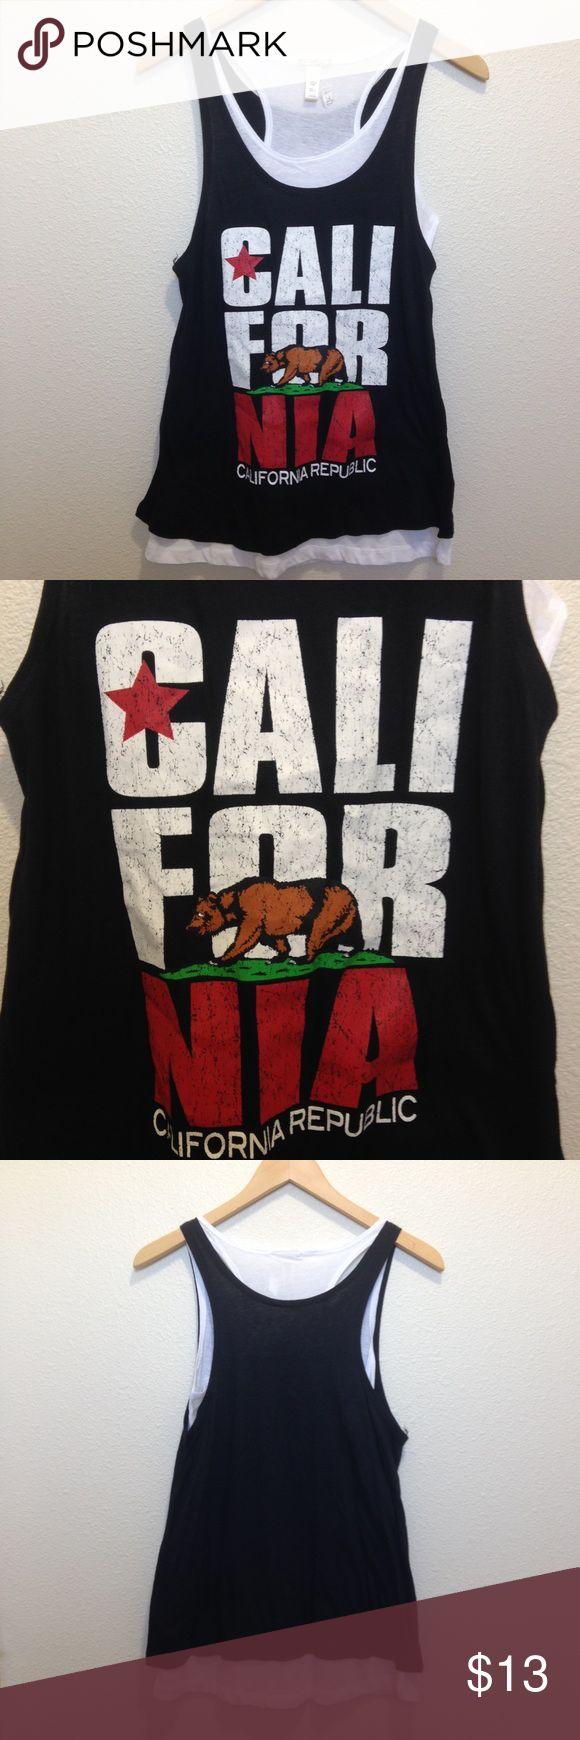 NWT Medium California halter top New with tags size medium women's California Republic flag halter top. Tops